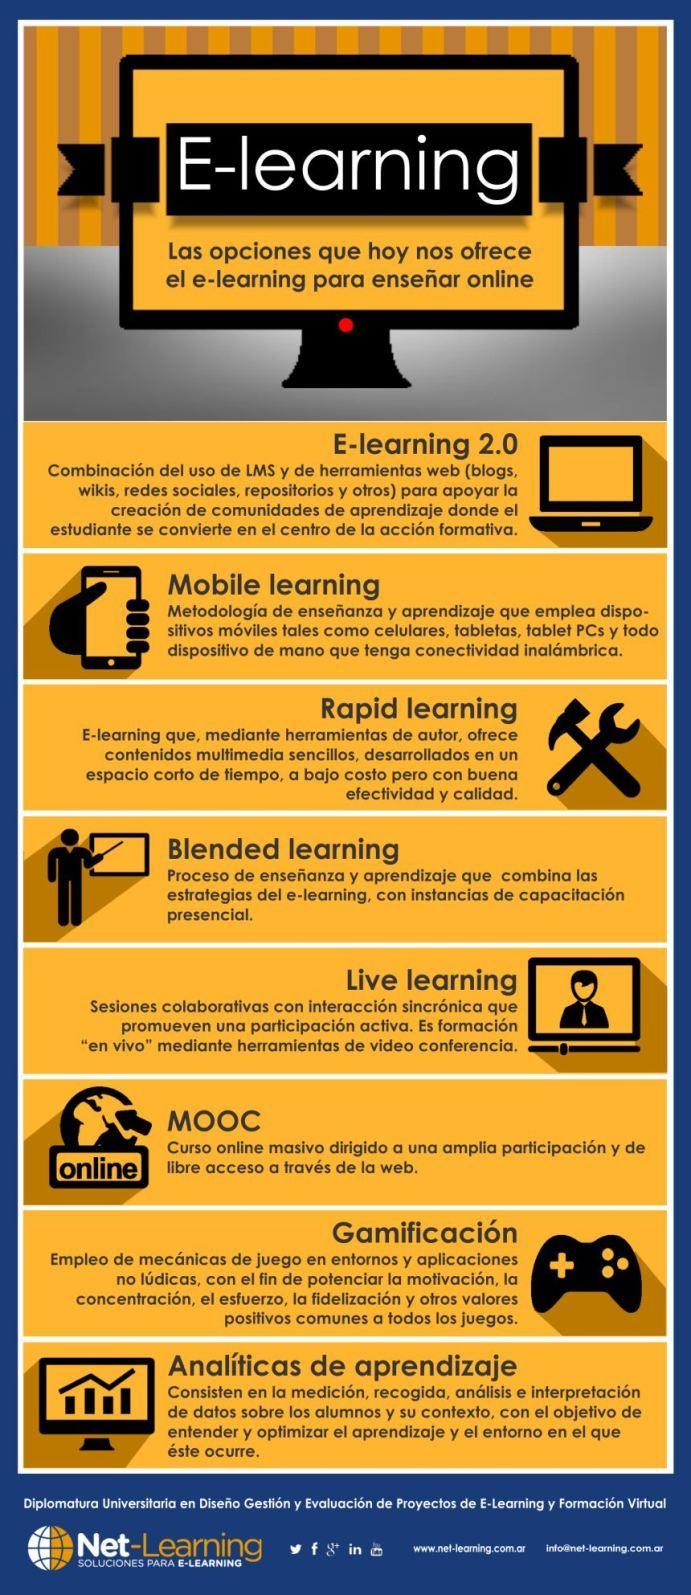 eLearning8ModelosEnseñanzaAprendizaje-Infografía-BlogGesvin